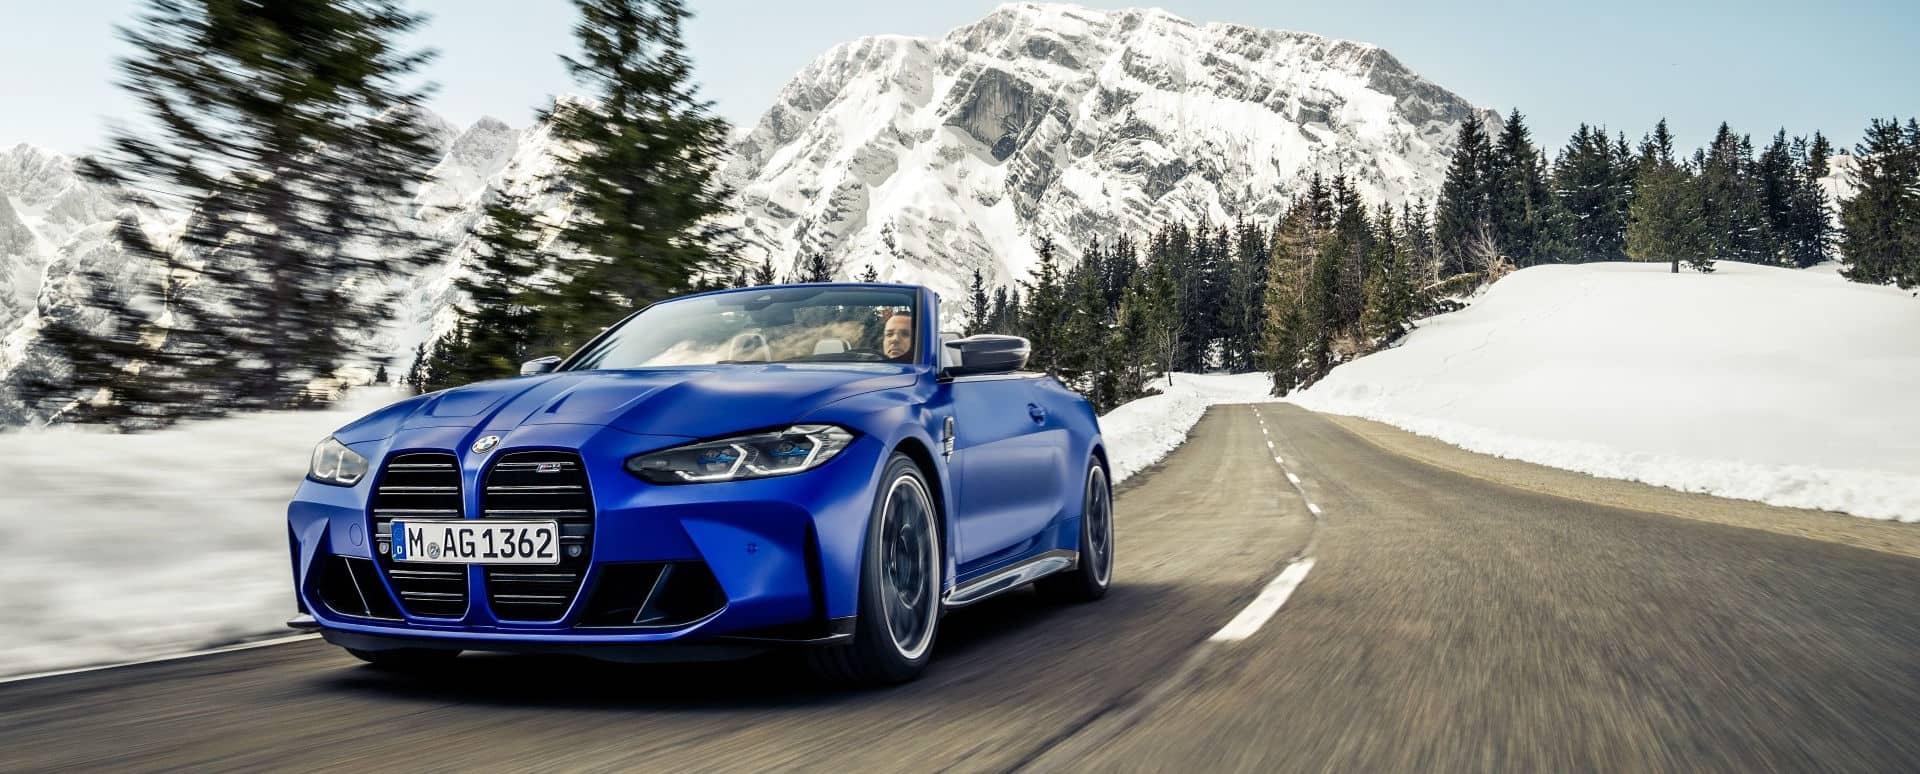 Blue BMW M4 Convertible